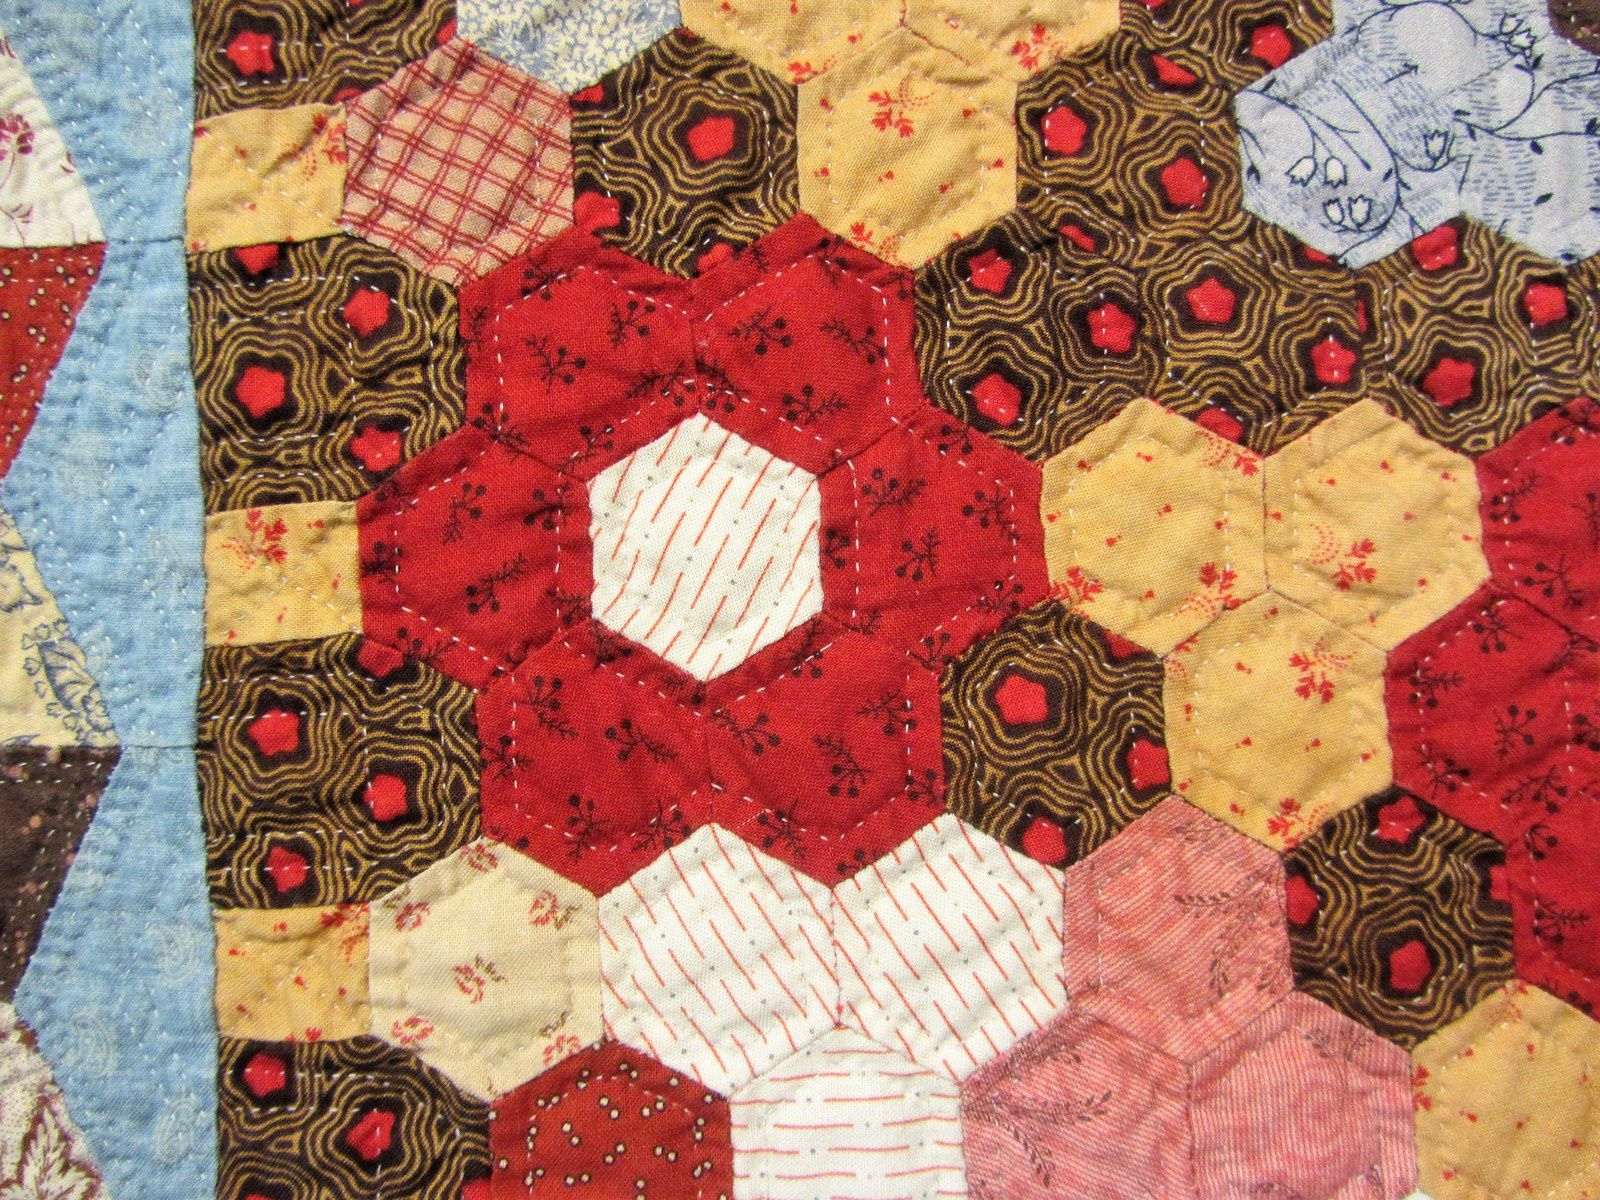 Brouage hexagones 2